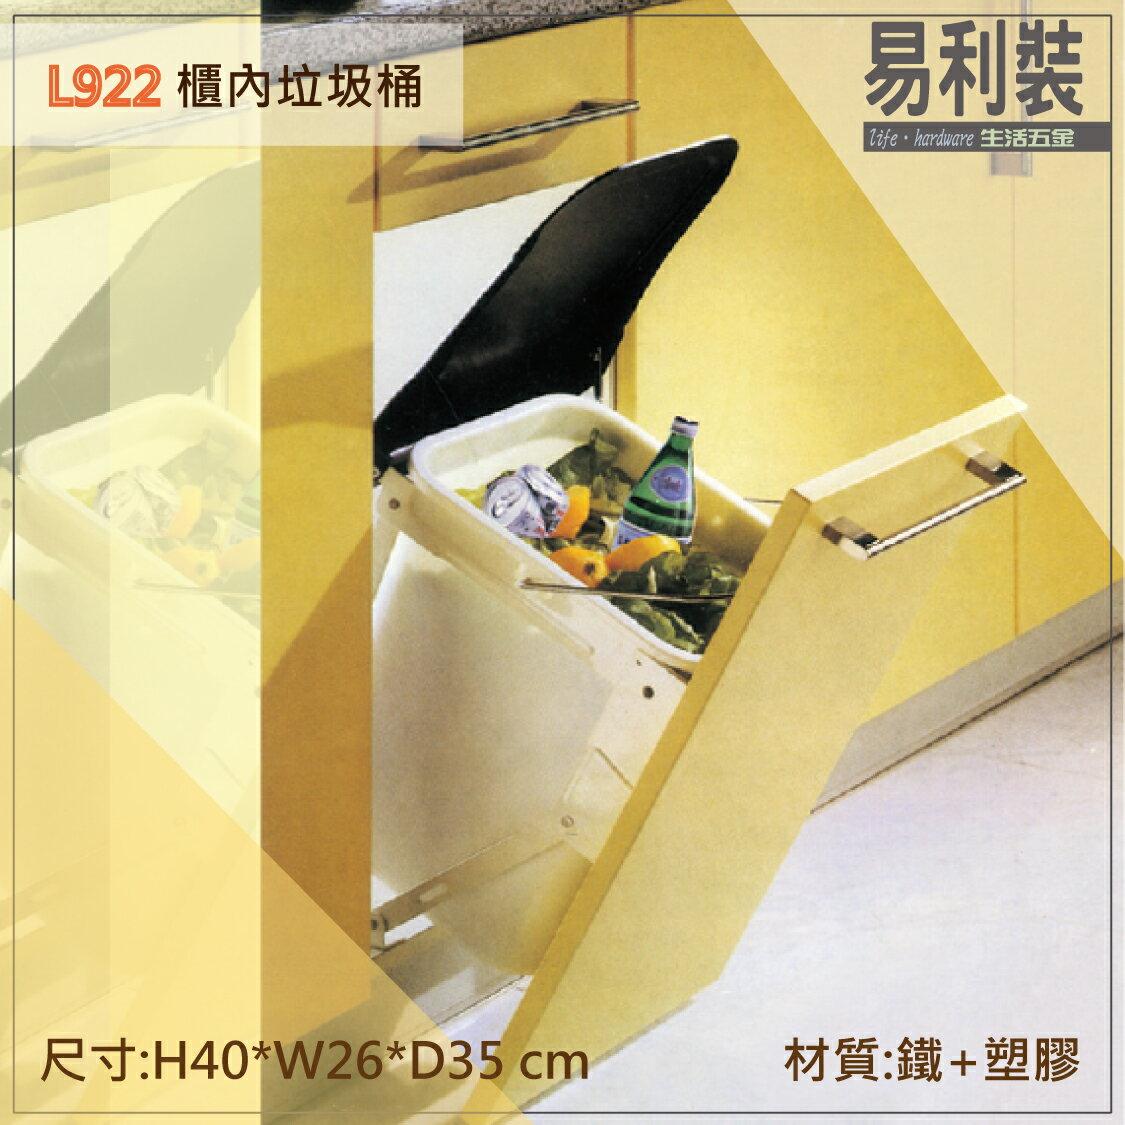 【 EASYCAN 】L922 櫃內垃圾桶 易利裝生活五金 廚房清潔桶 垃圾桶 房間 臥房 衣櫃 小資族 辦公家具 系統家具 1